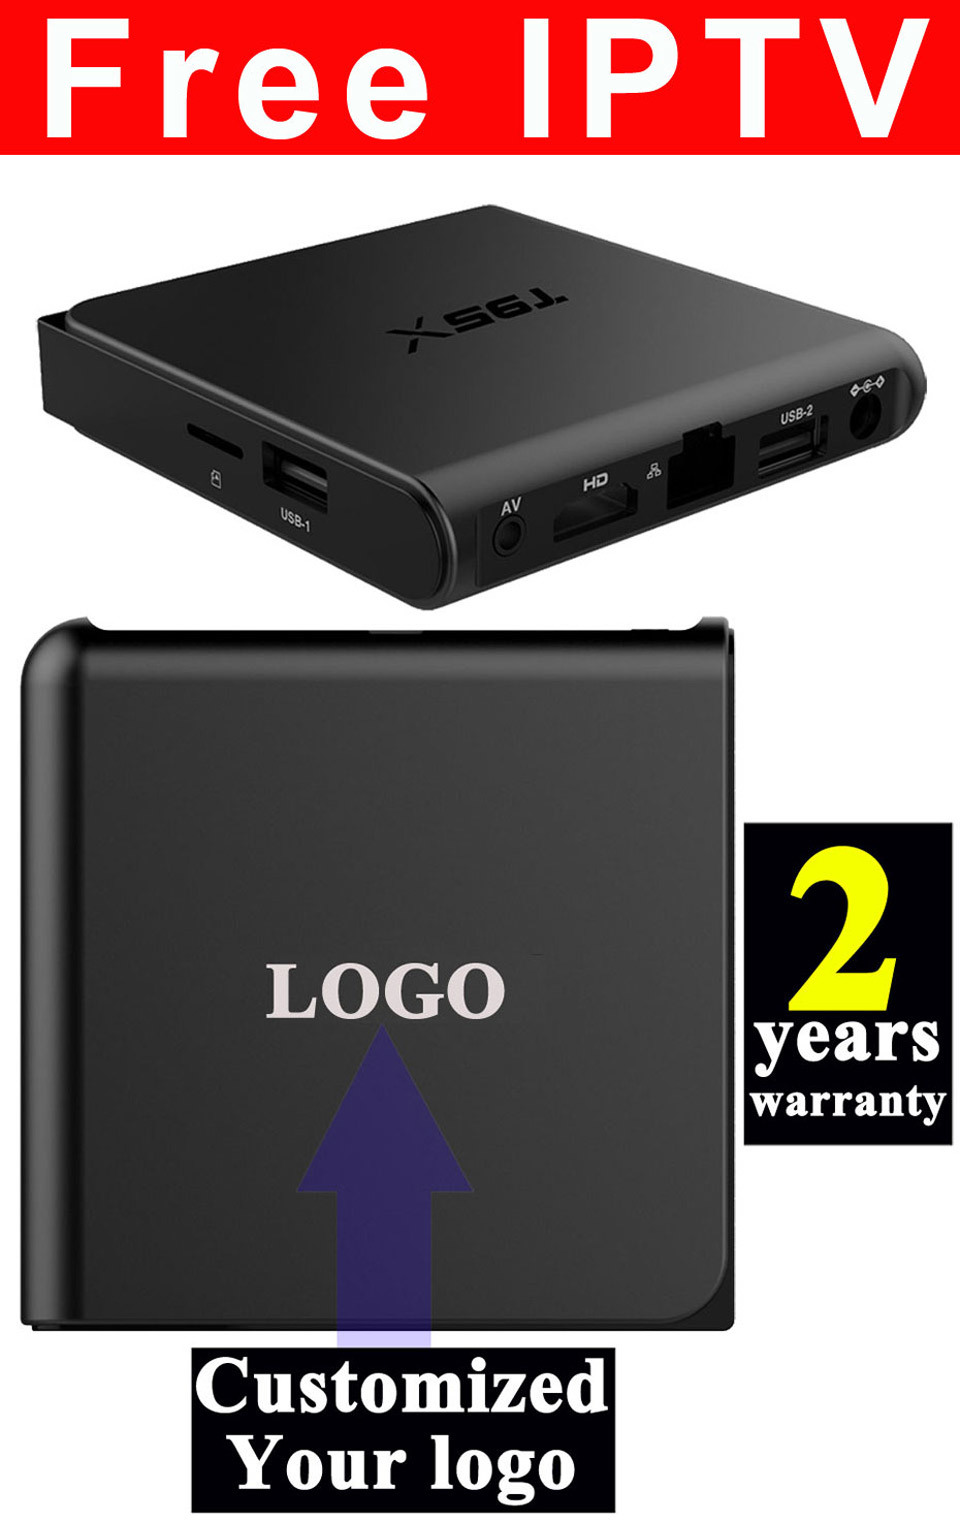 Custom Made Free IPTV Android6.0 Marshallow TV Box S905X Quad Core T95X-1GB/8GB